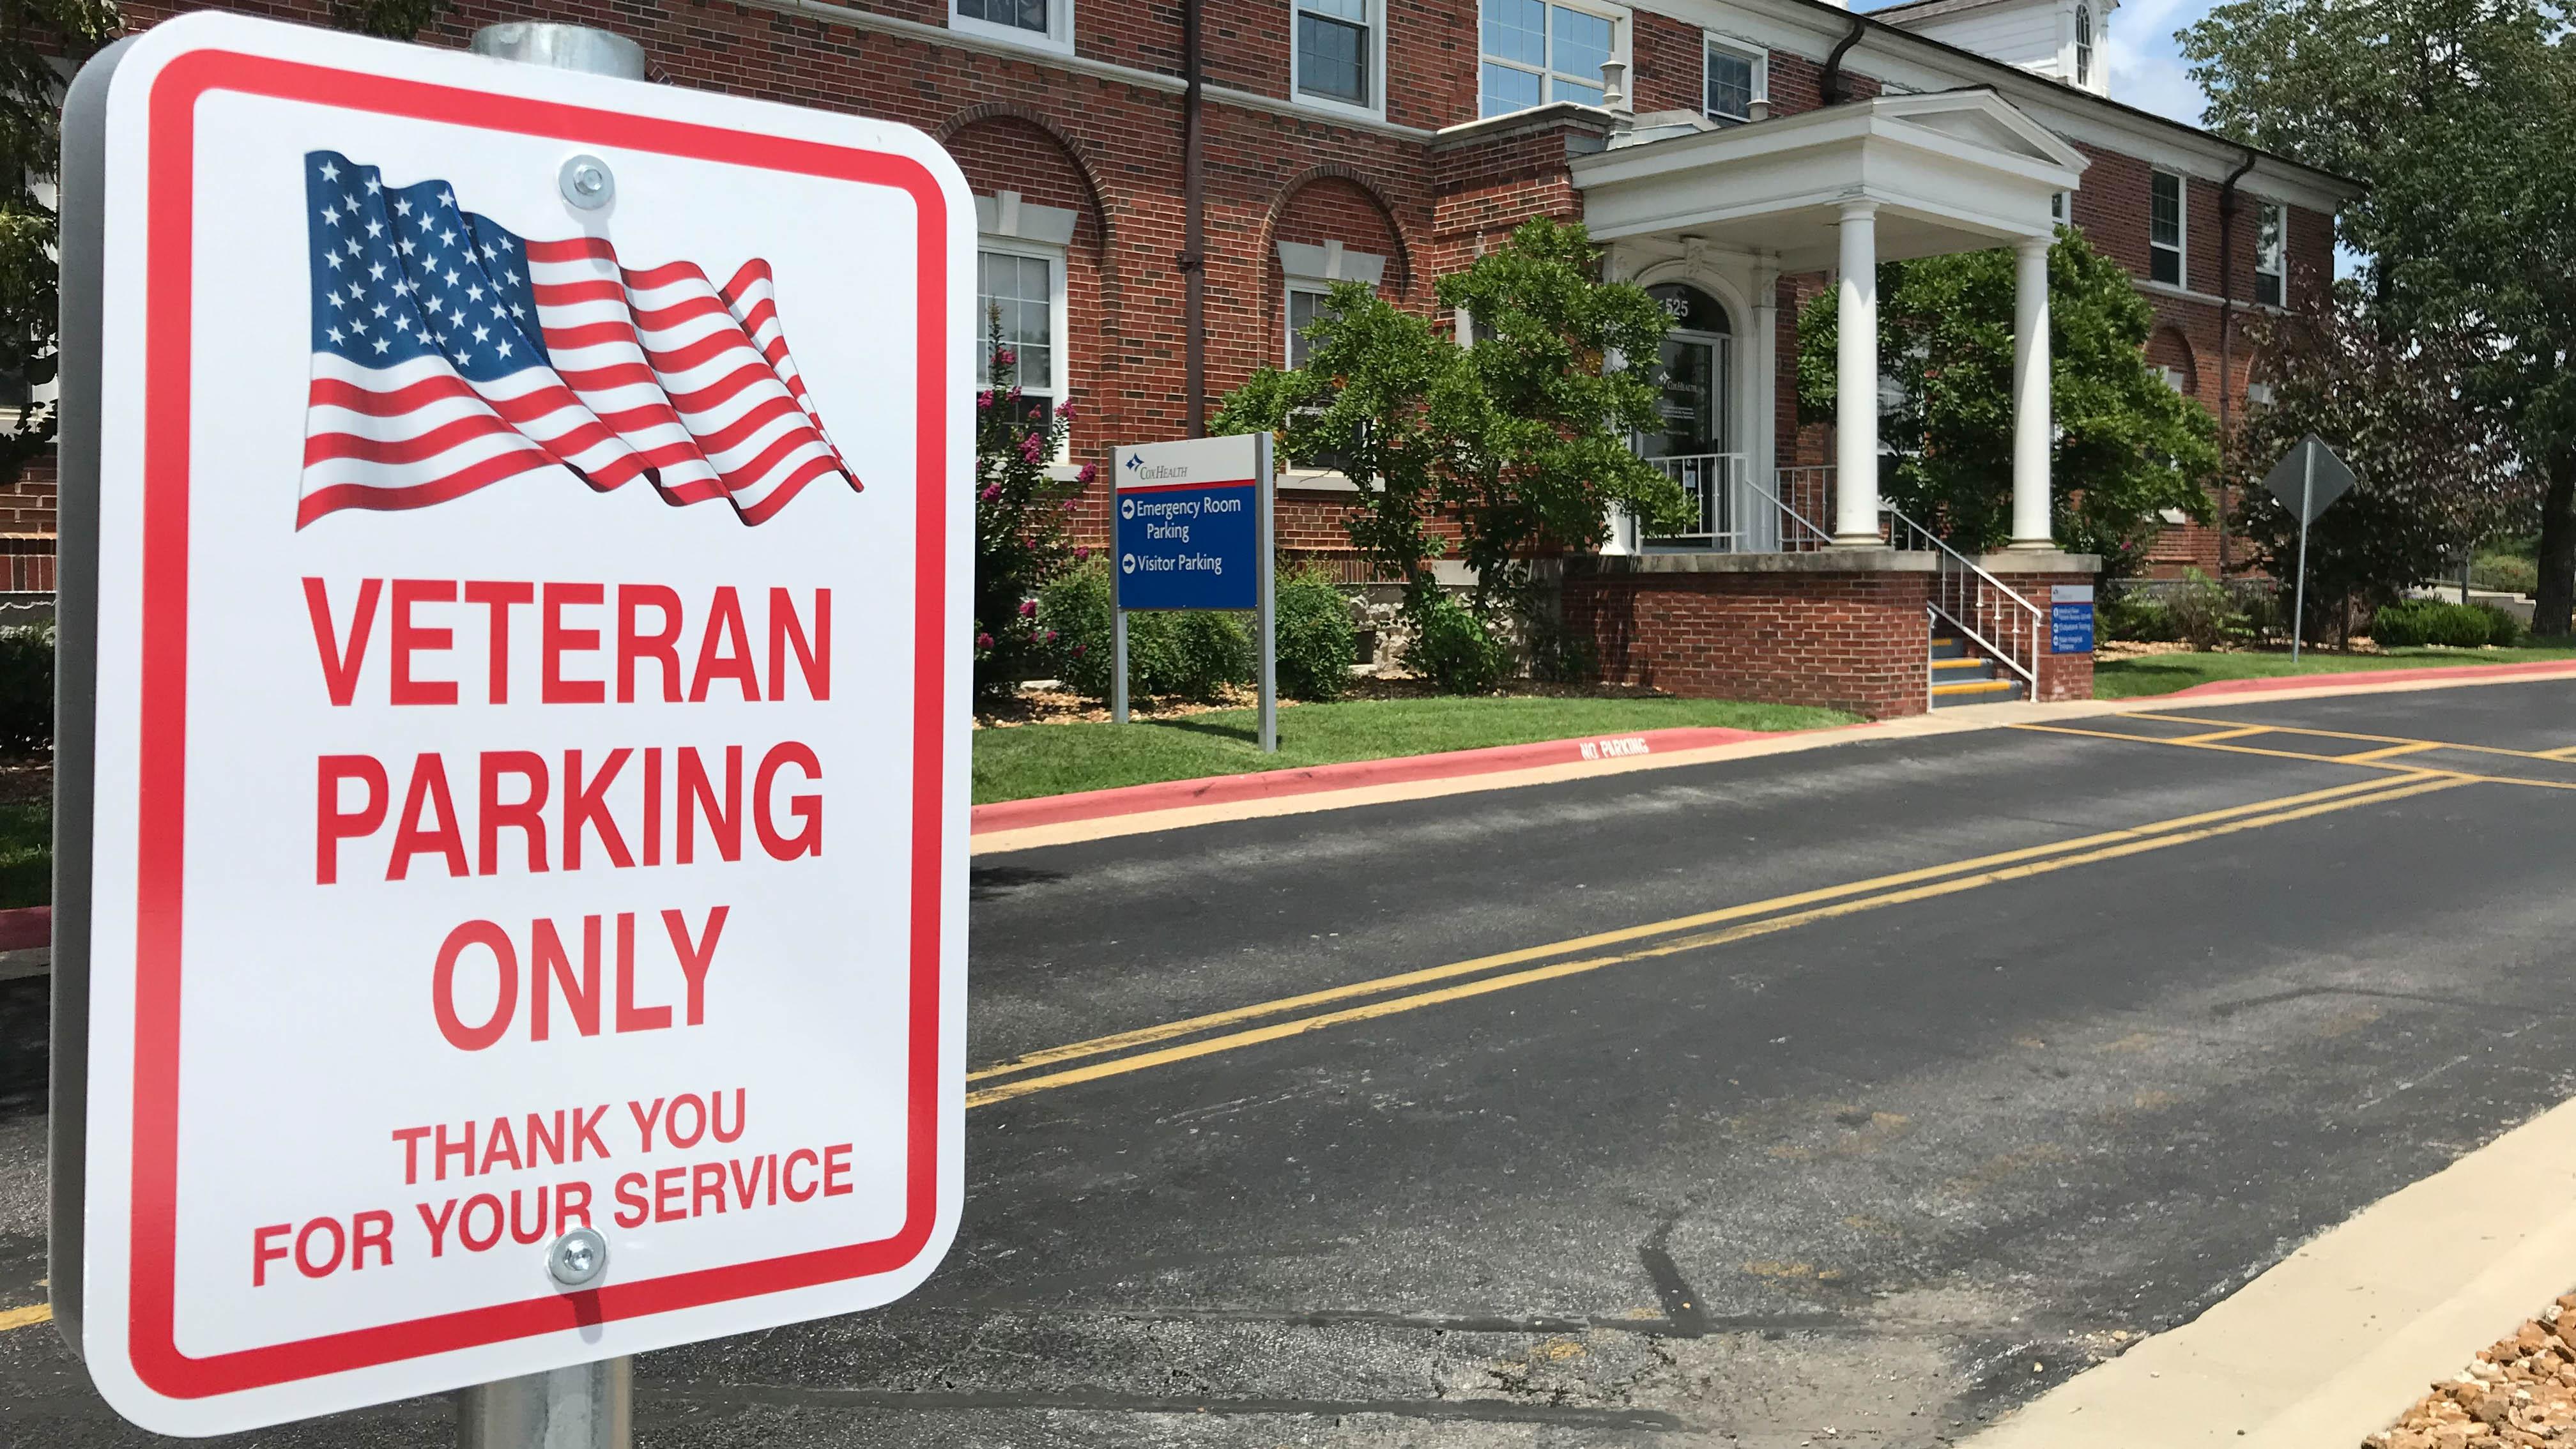 VeteransParking - Cox Medical Center Branson adds VIP parking for Veterans